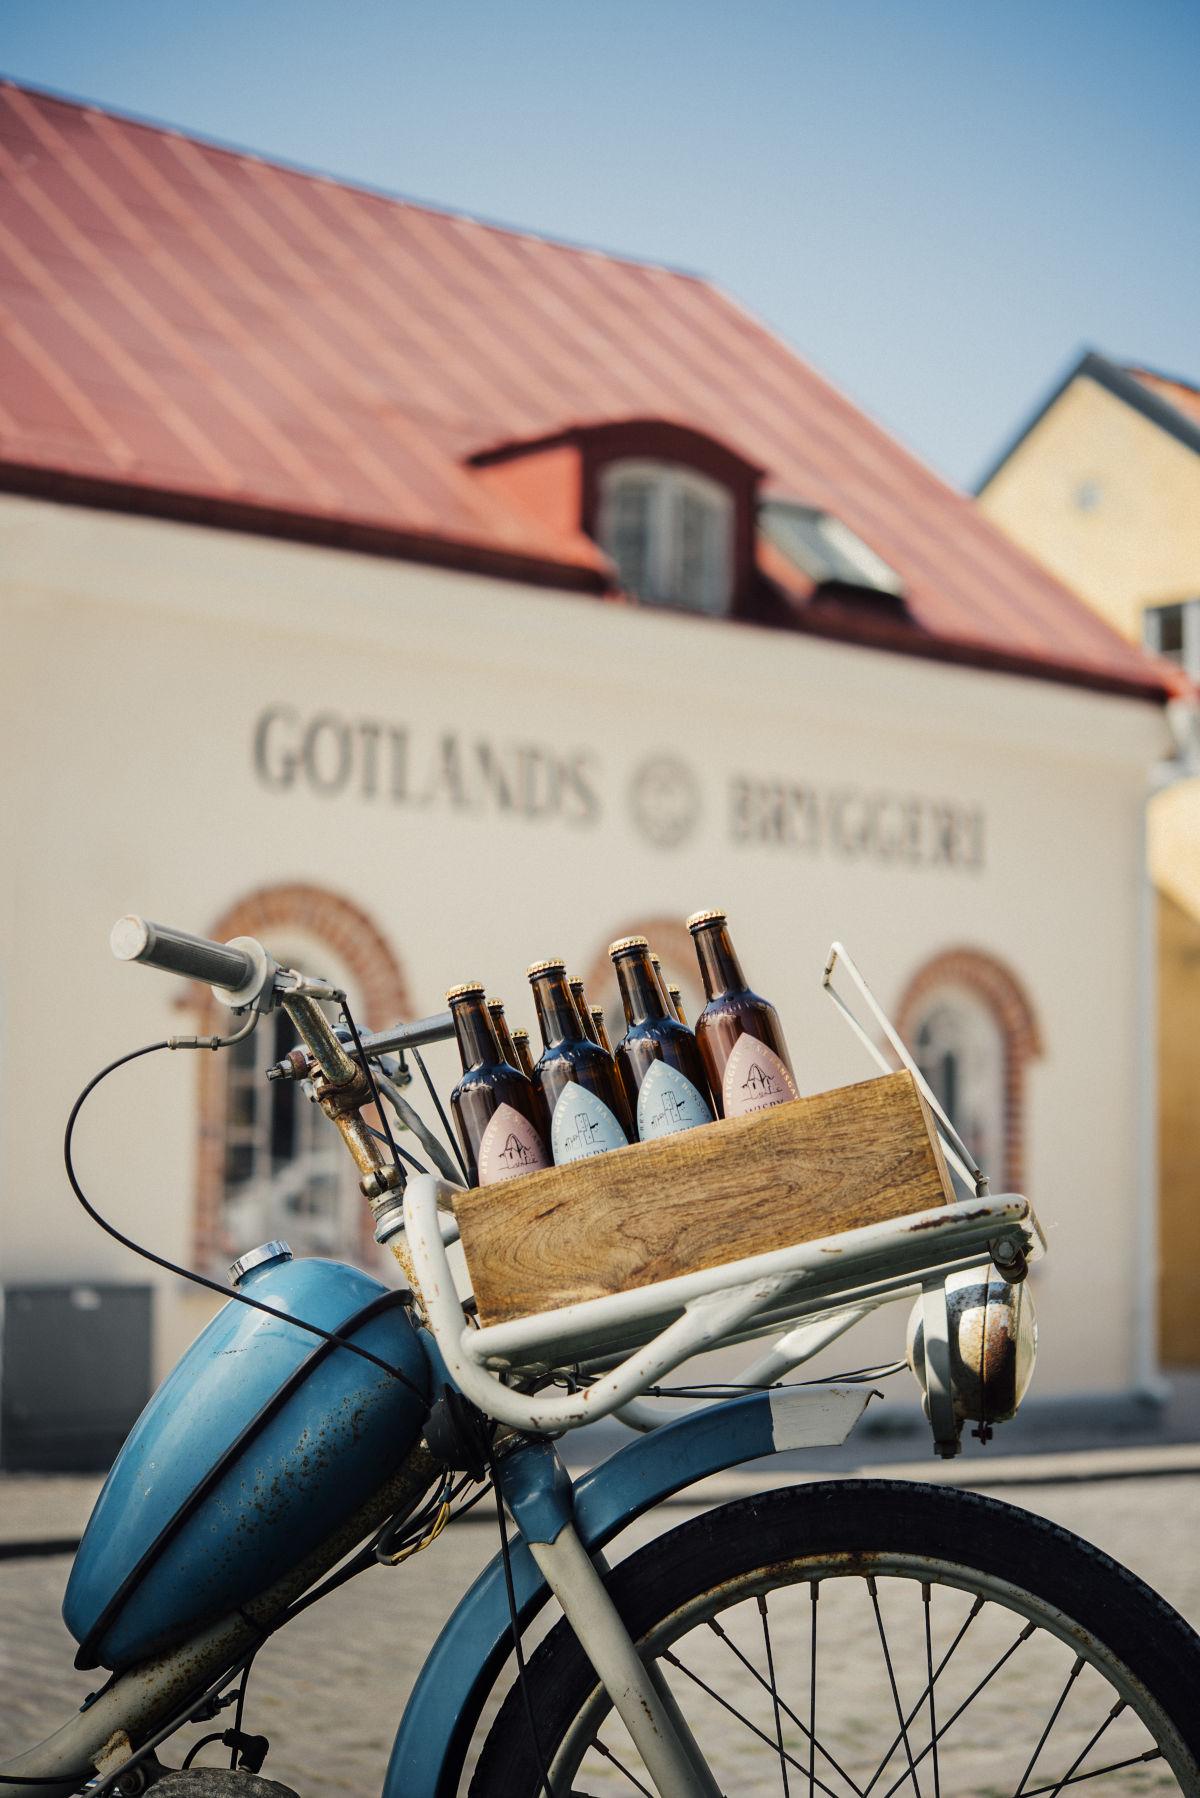 gotlands bryggeri